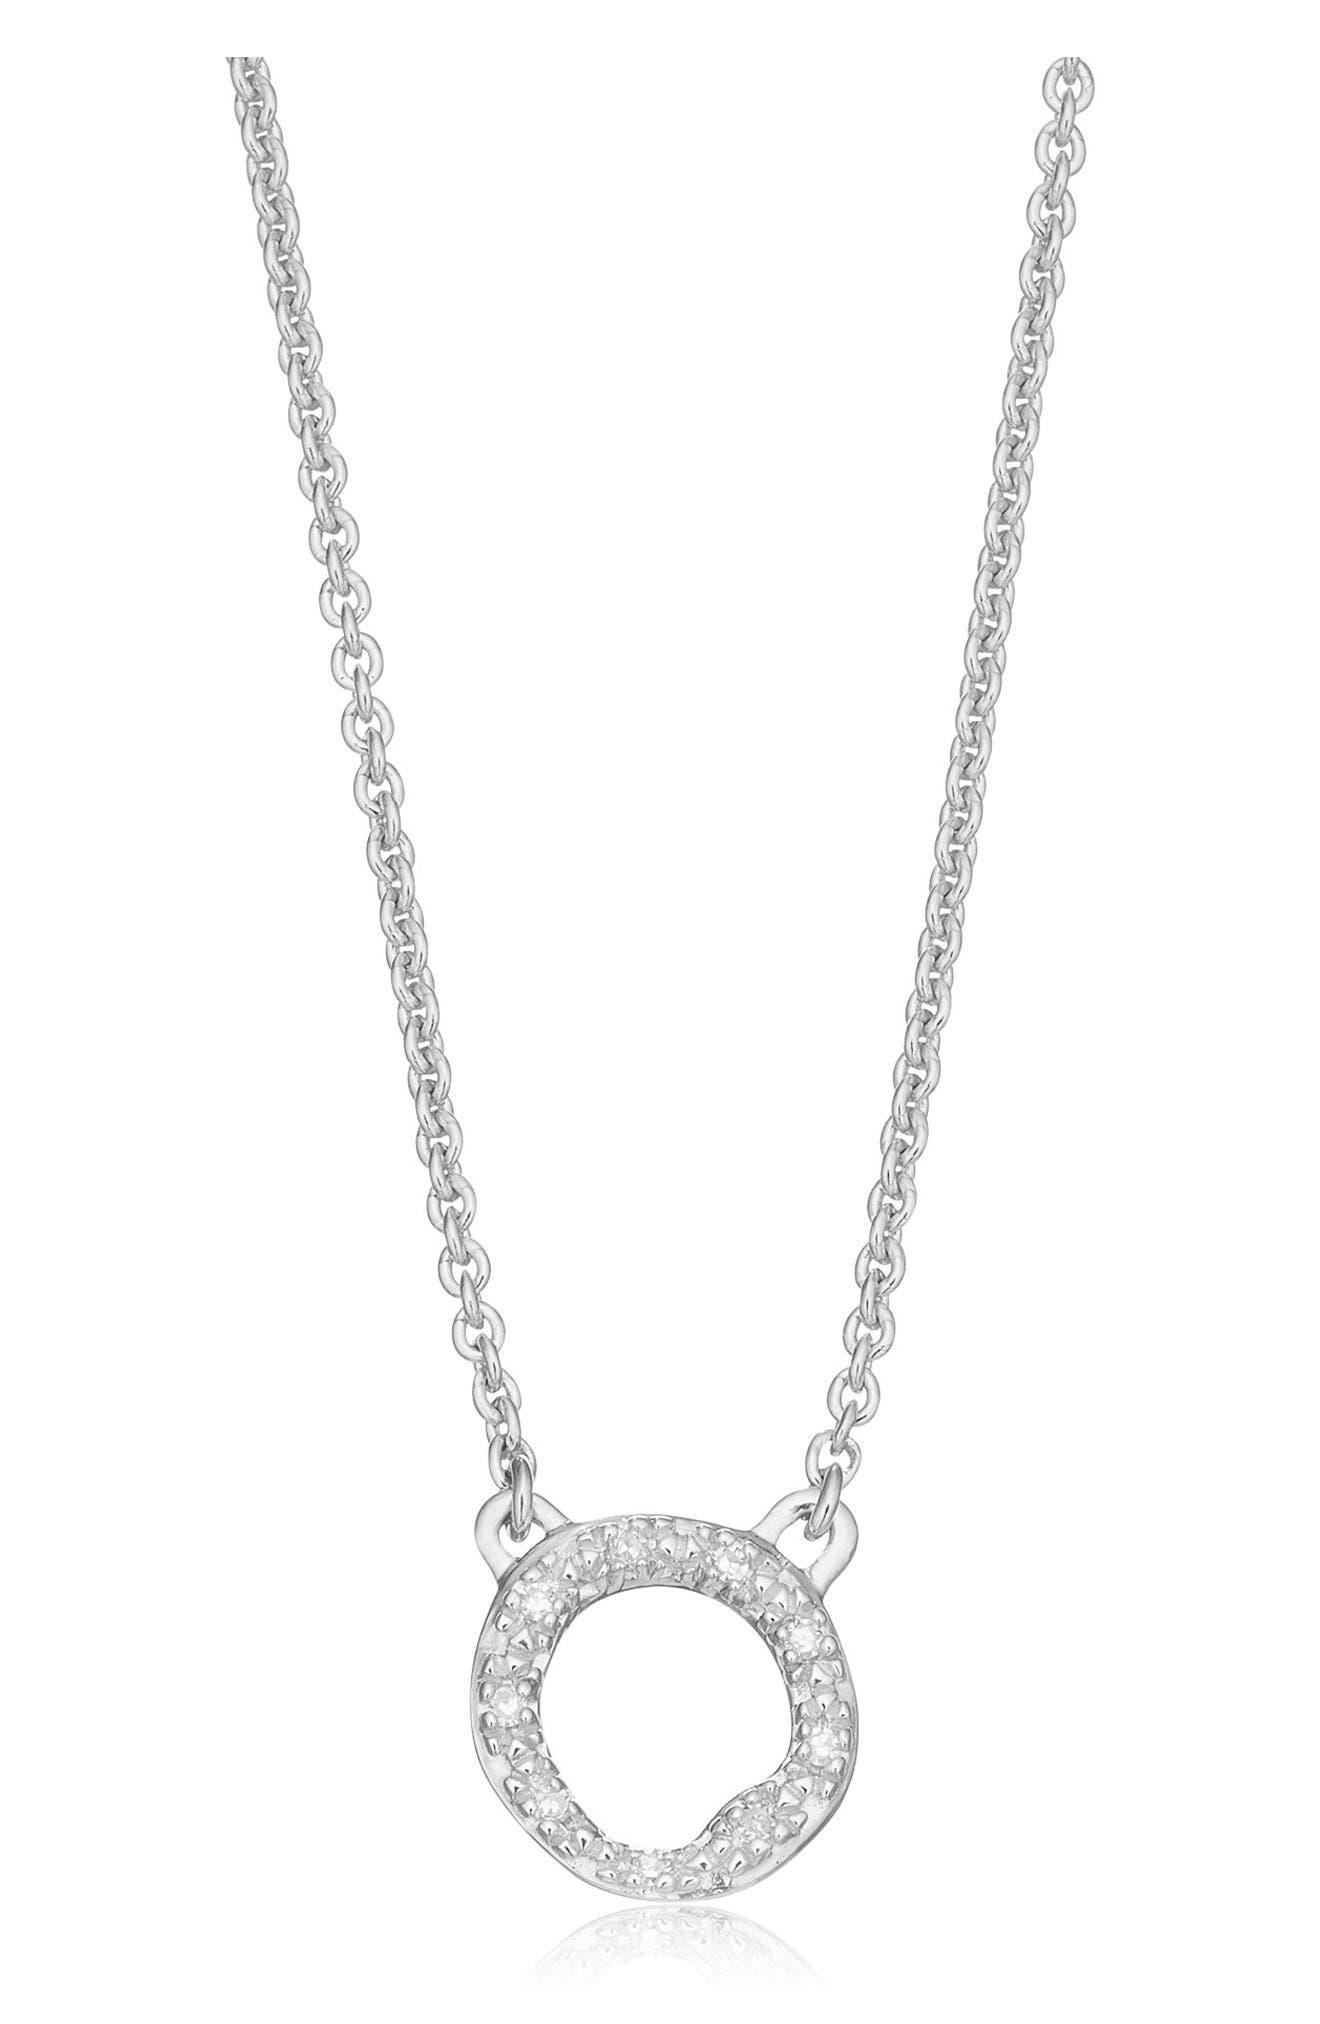 Riva Diamond Circle Pendant Necklace,                             Main thumbnail 1, color,                             SILVER/ DIAMOND